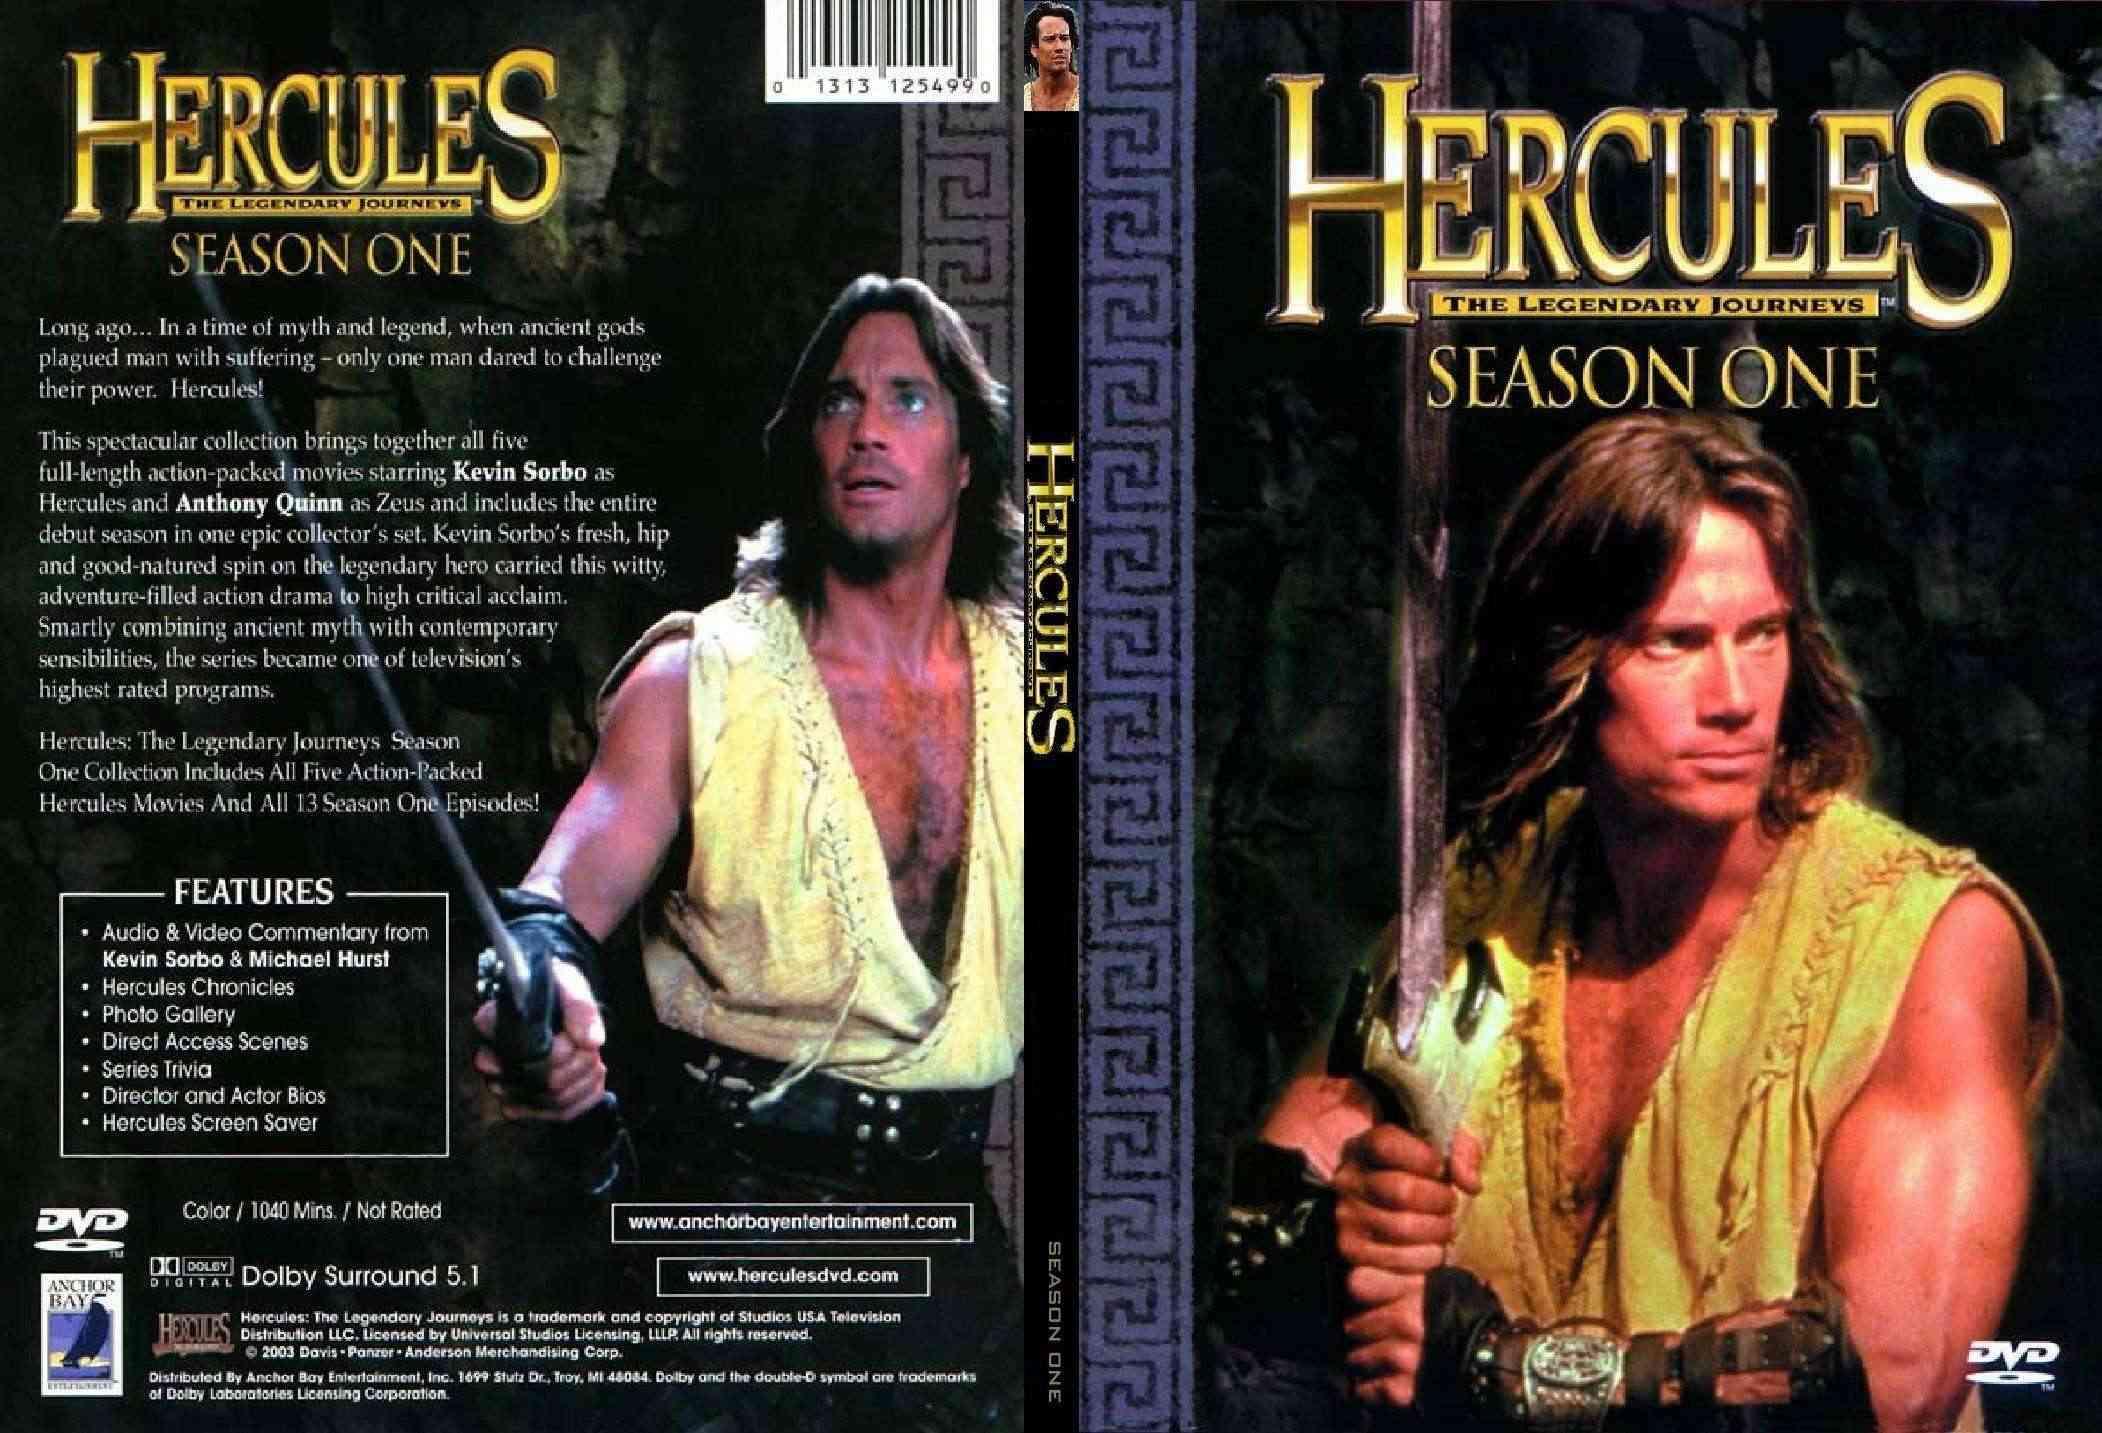 hercules los viajes legendarios [pedido] latino T1